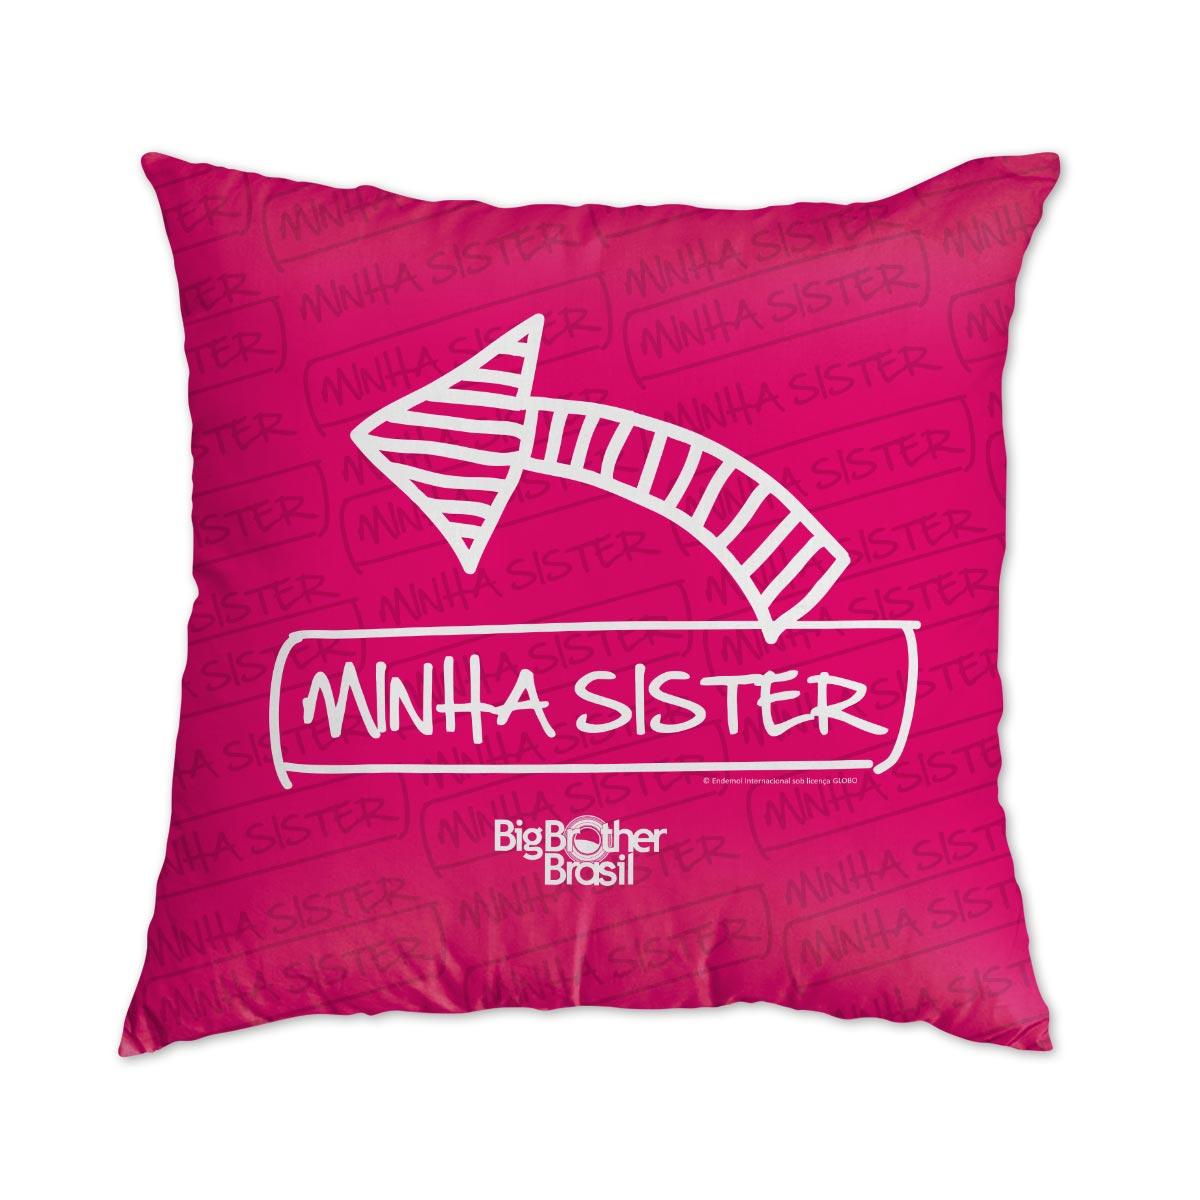 Almofada Big Brother Brasil 15 Minha Sister